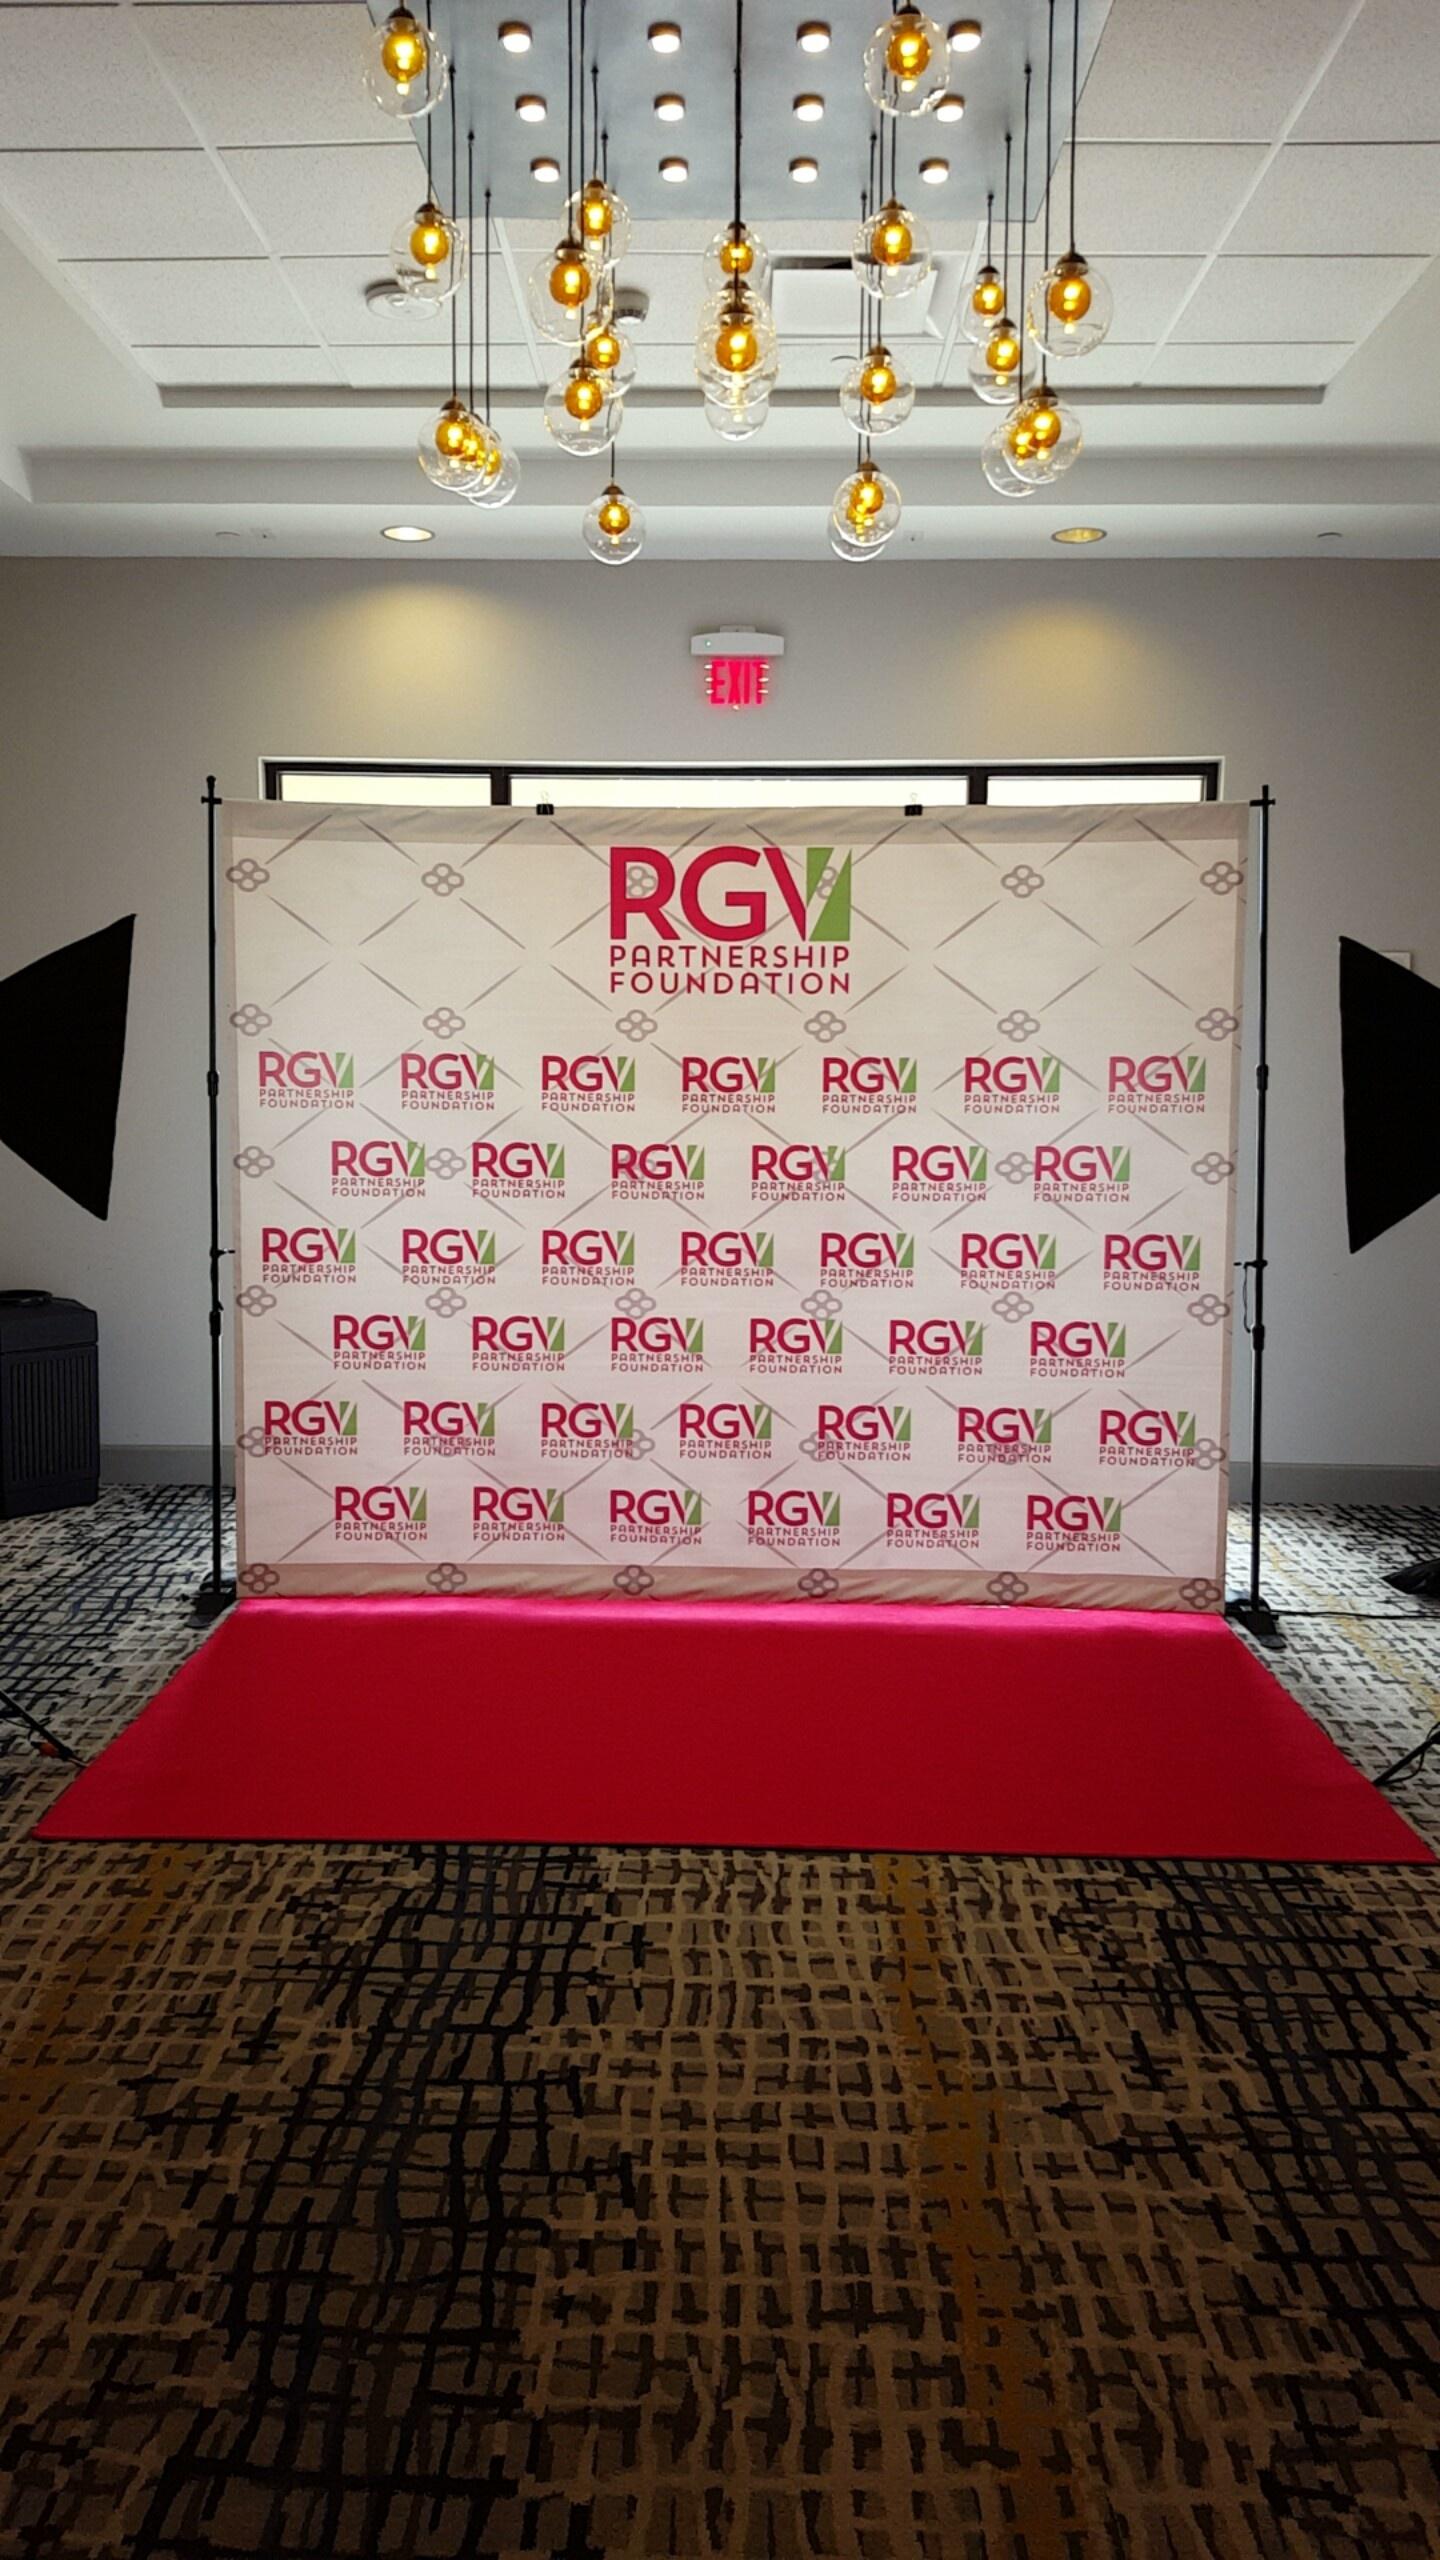 RGV Partnership Foundation Banner